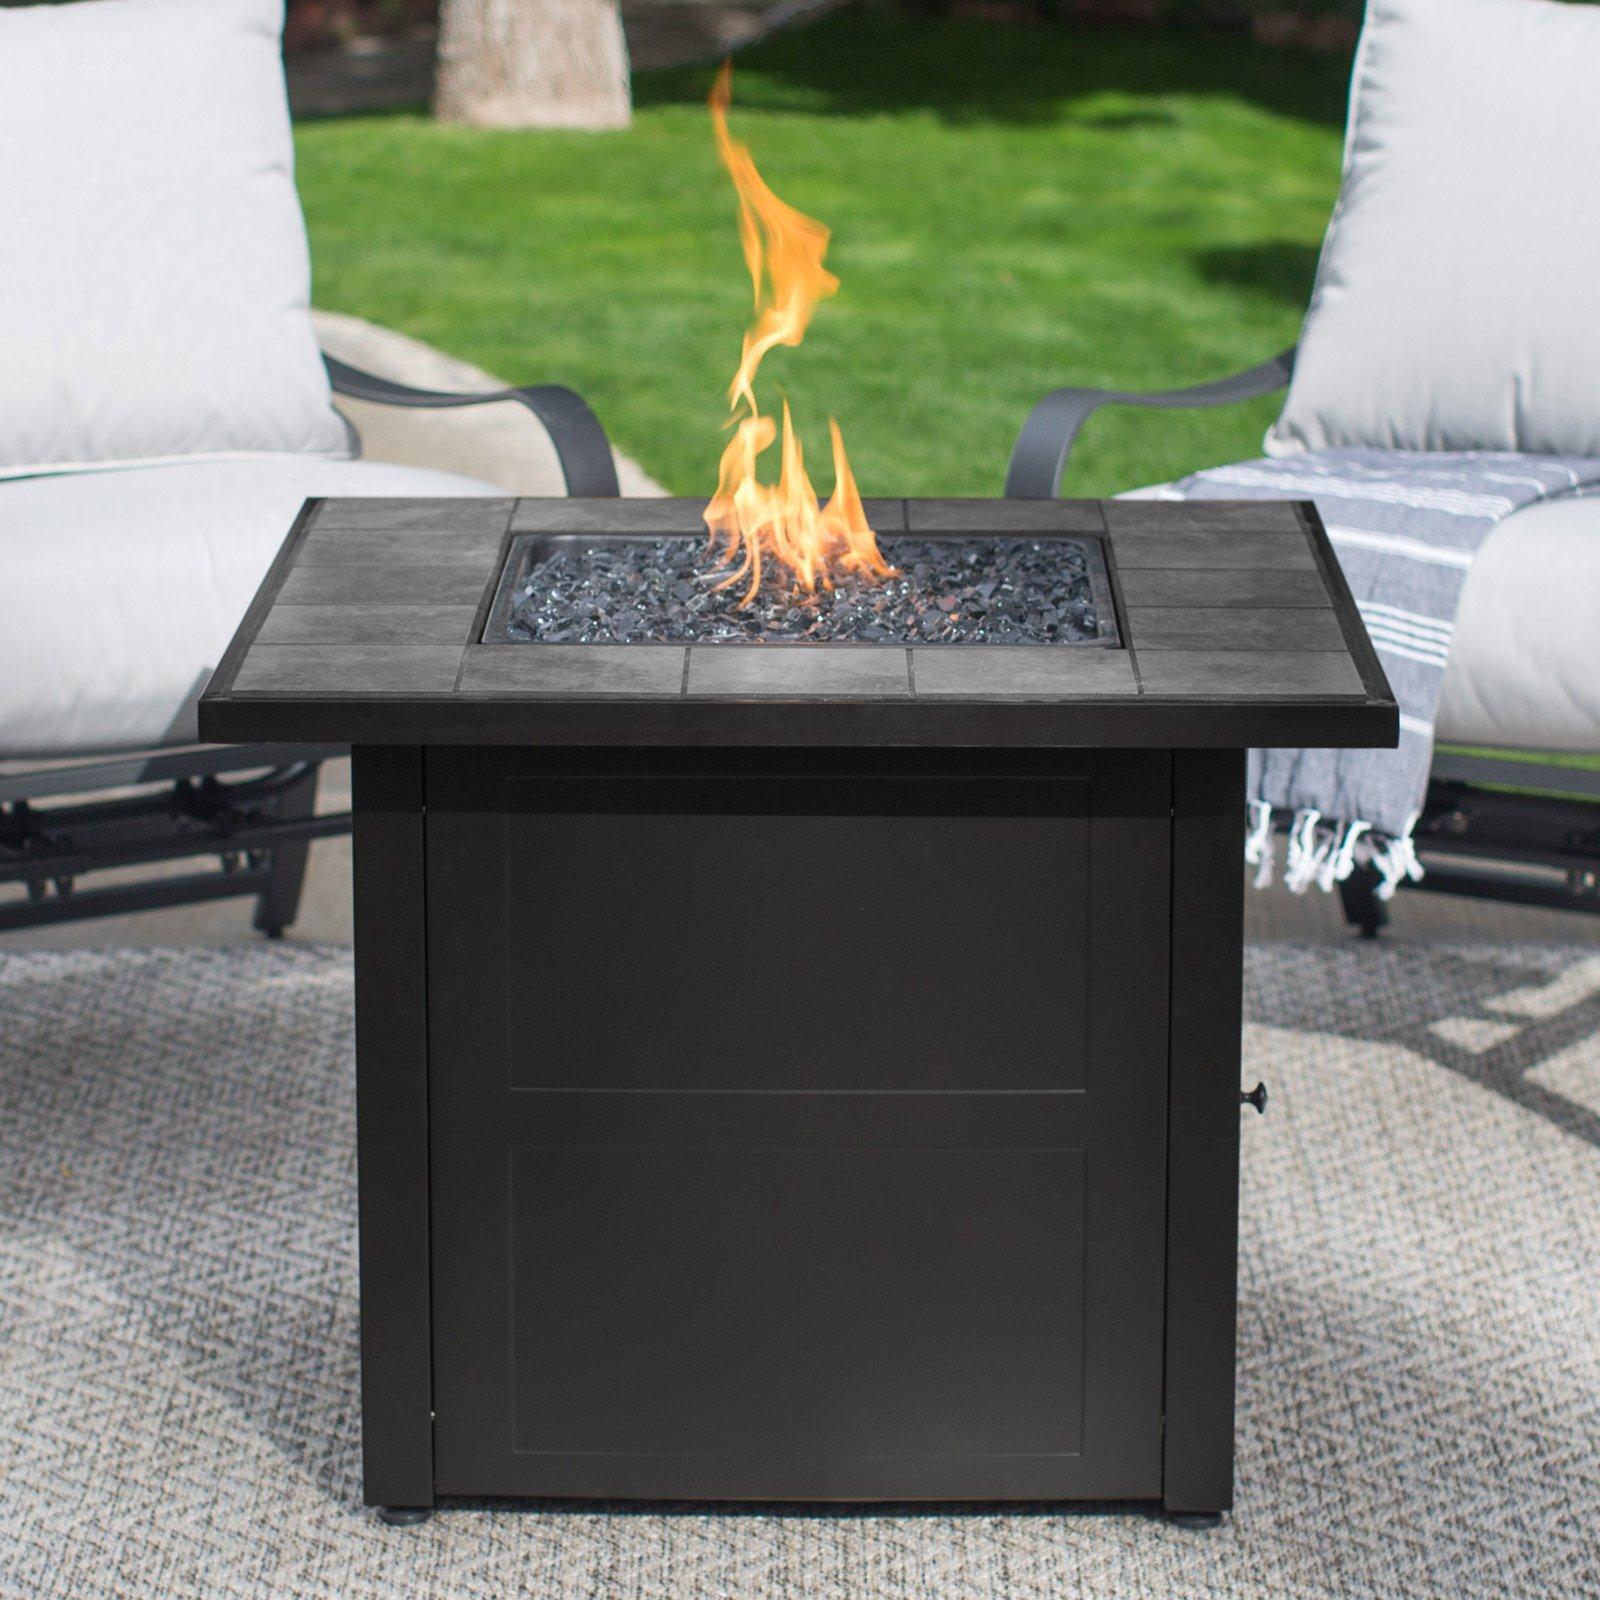 Endless Summer Lp Gas Outdoor Fire Pit Slate Tile Mantel Walmart within measurements 1600 X 1600